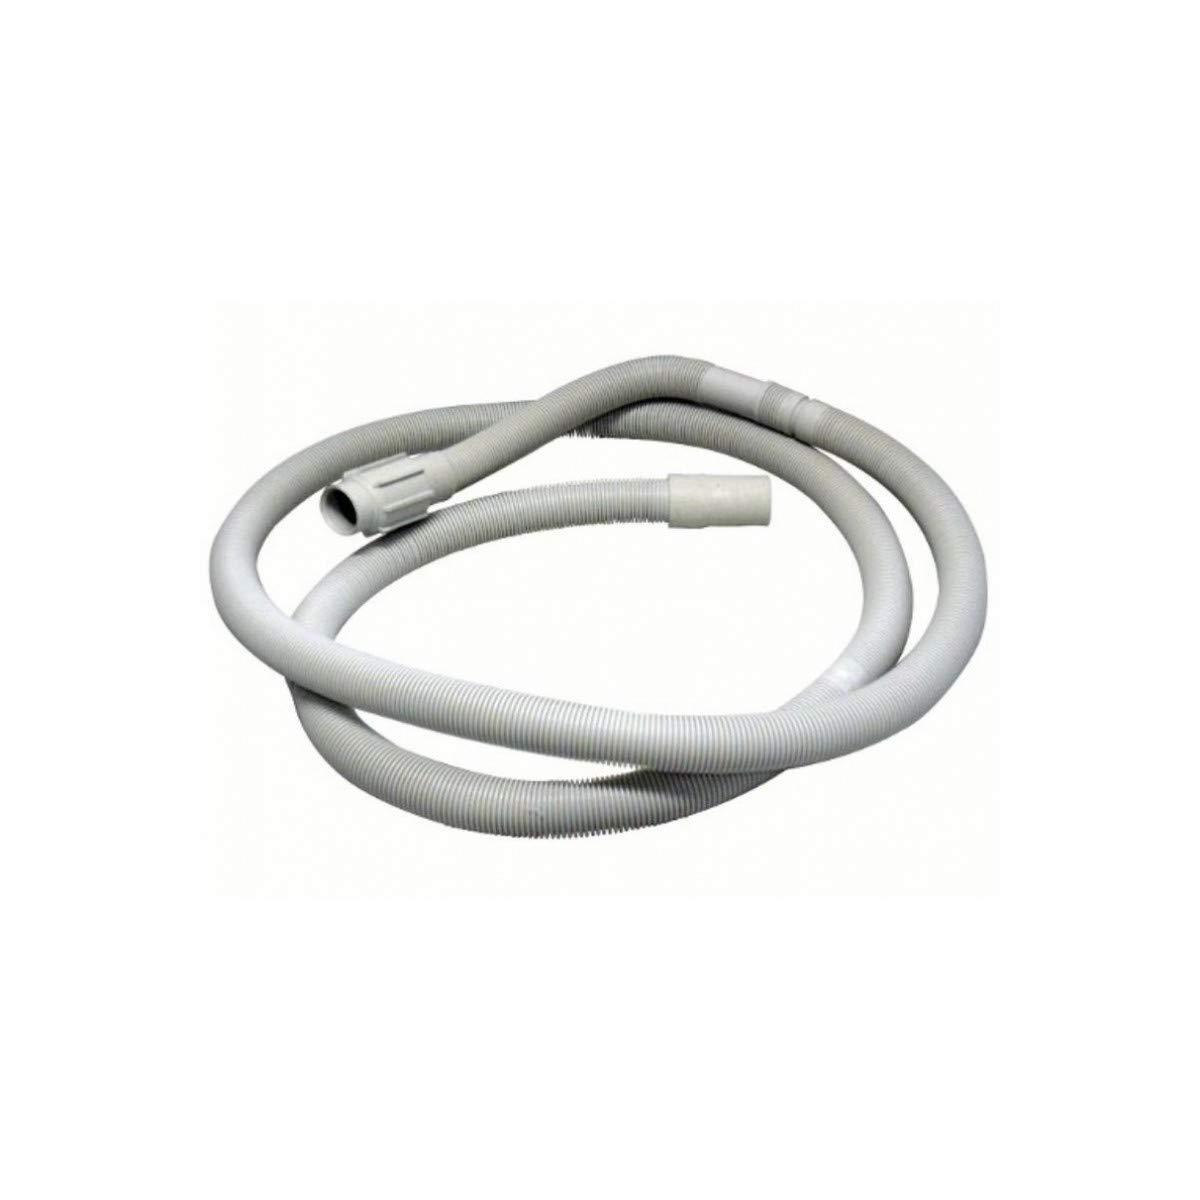 Recamania Tubo desague lavavajillas Whirpool ADG95271 481253029113 ...